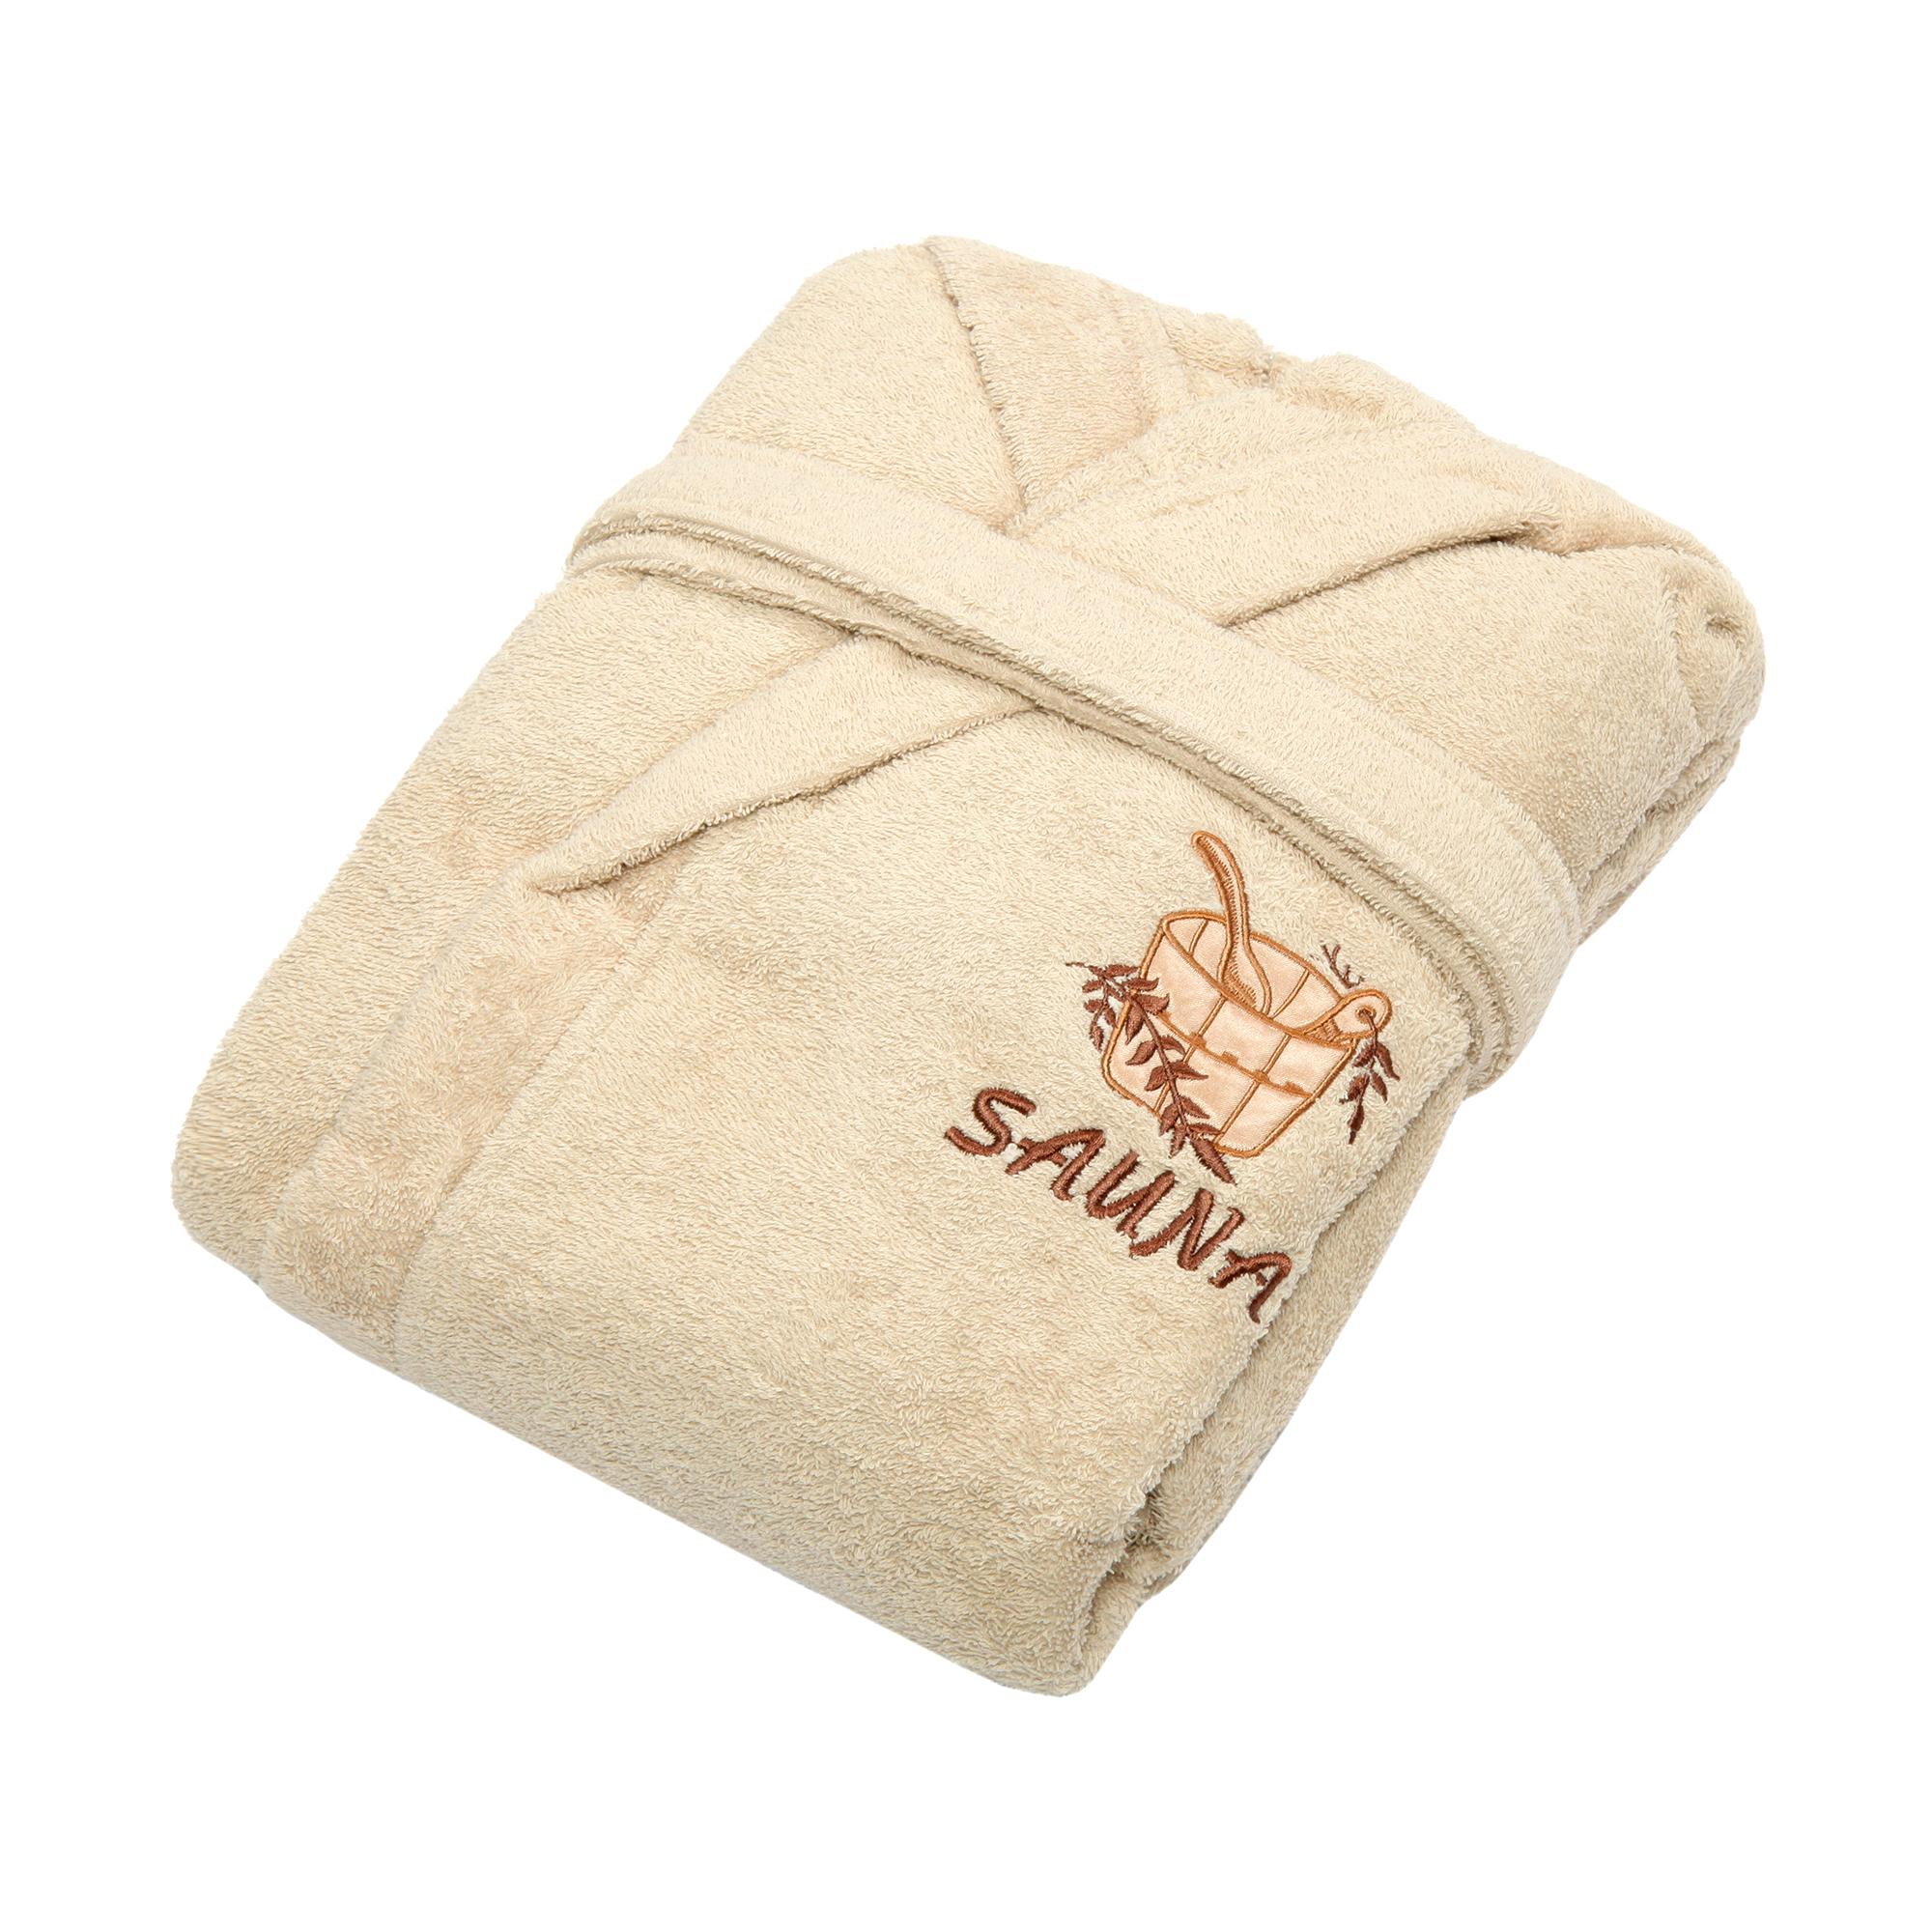 Халат мужской Asil sauna kimono brown m махровый.